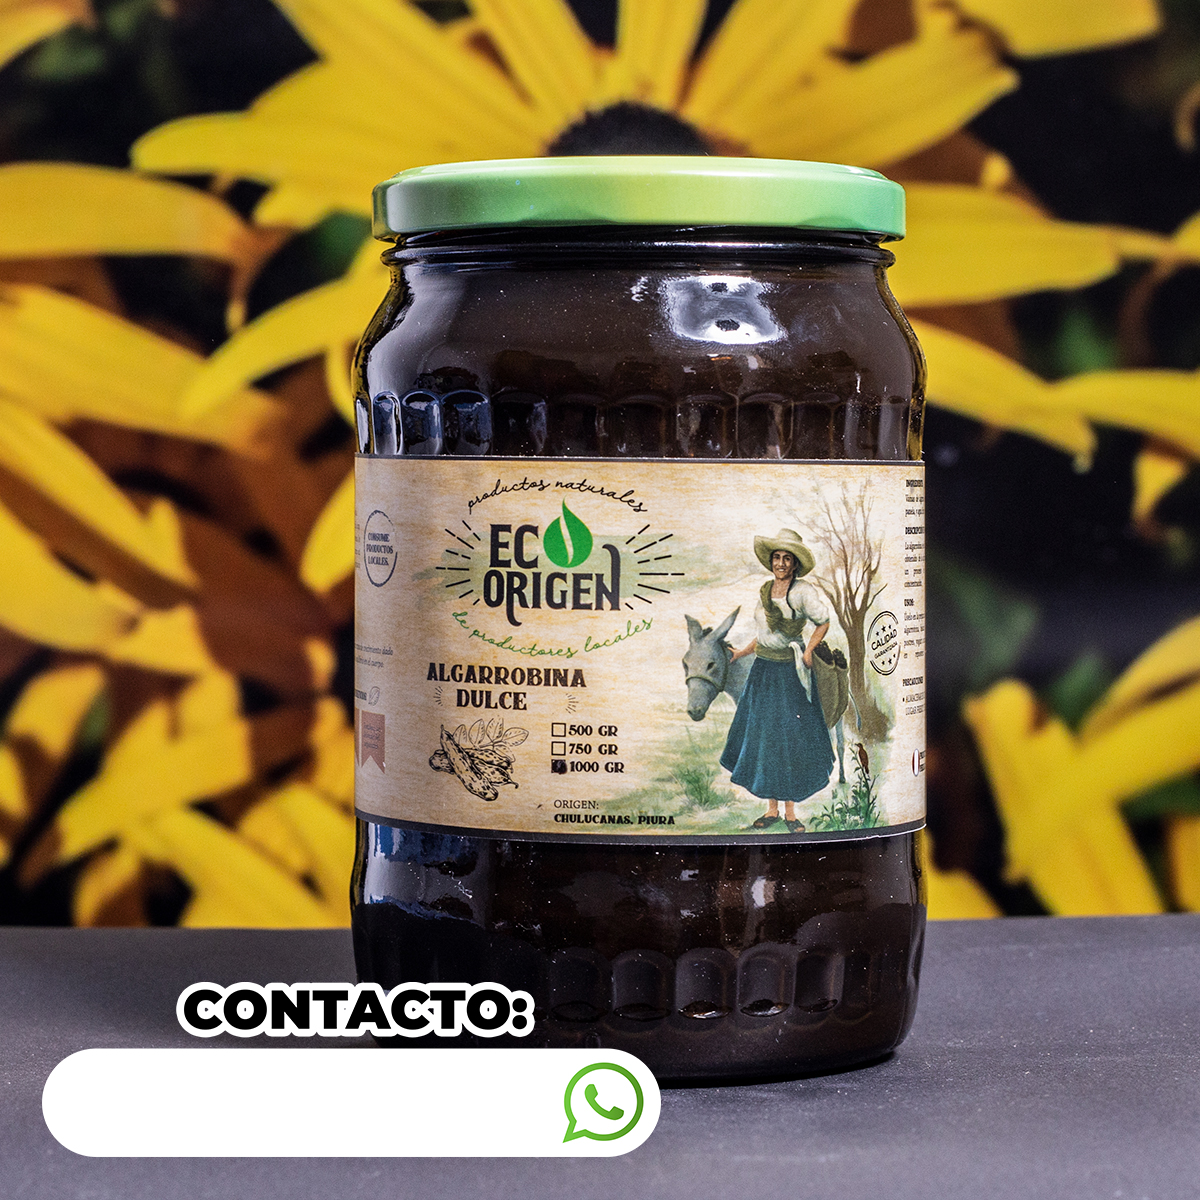 Algarrobina dulce x 1000 gr Eco Origen